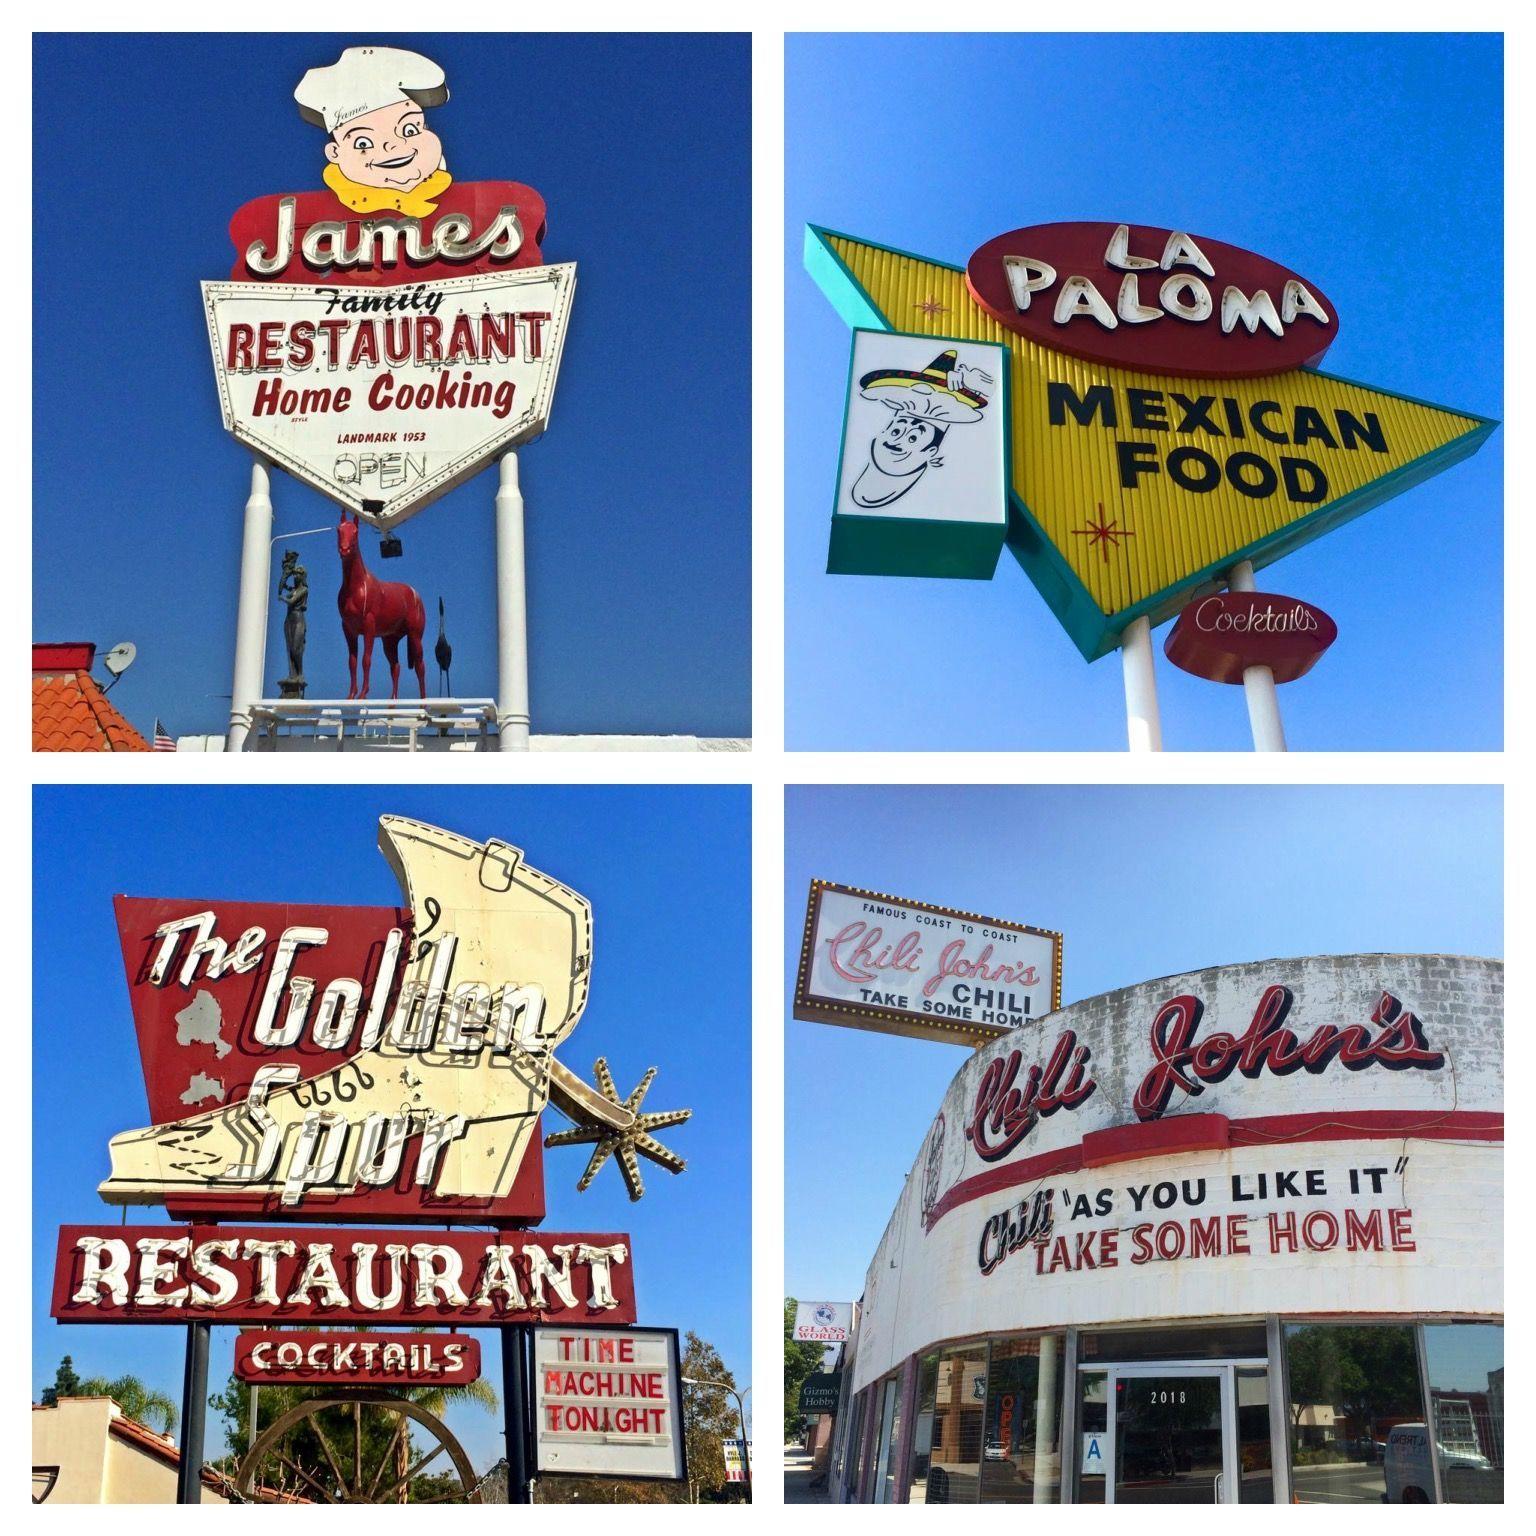 Photo By Nikki Kreuzer With Images Los Angeles Restaurants Vintage Restaurant Restaurant